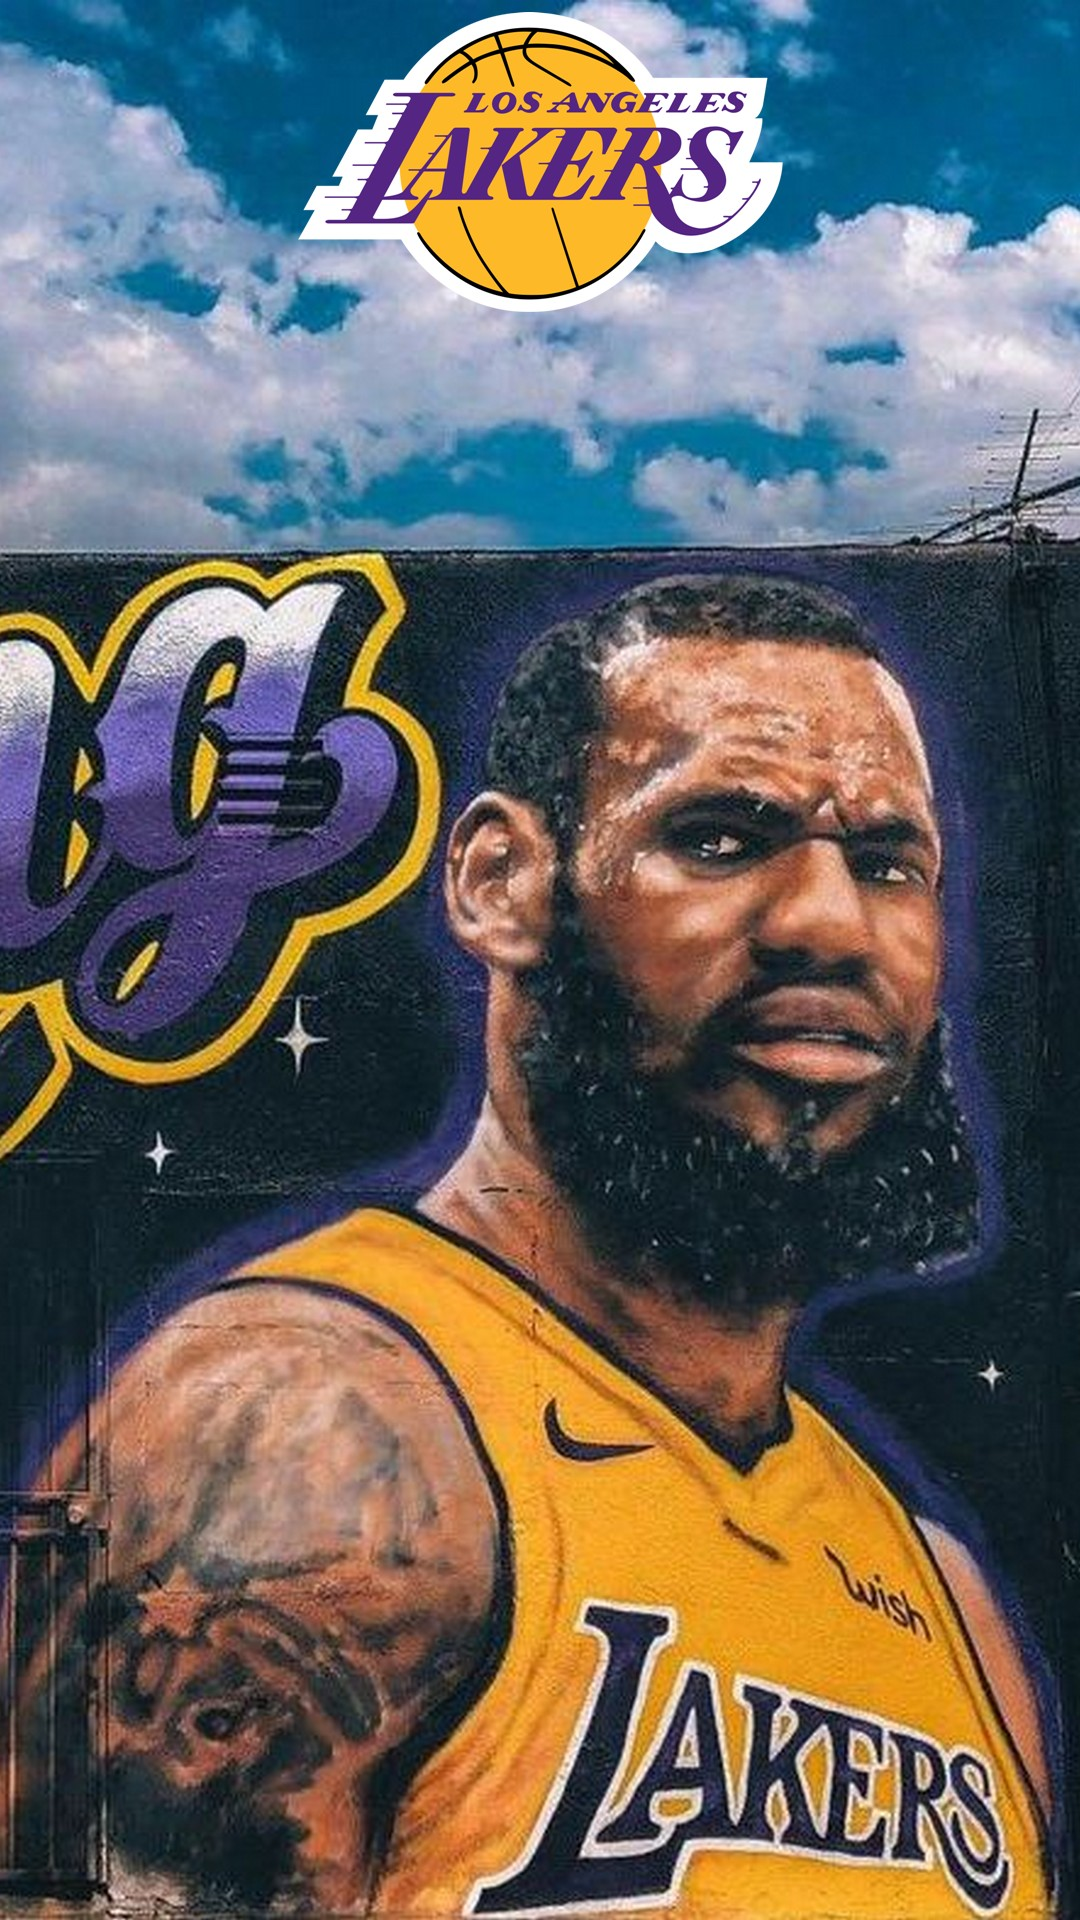 LA Lakers LeBron James iPhone 8 Wallpaper 2020 Basketball Wallpaper 1080x1920